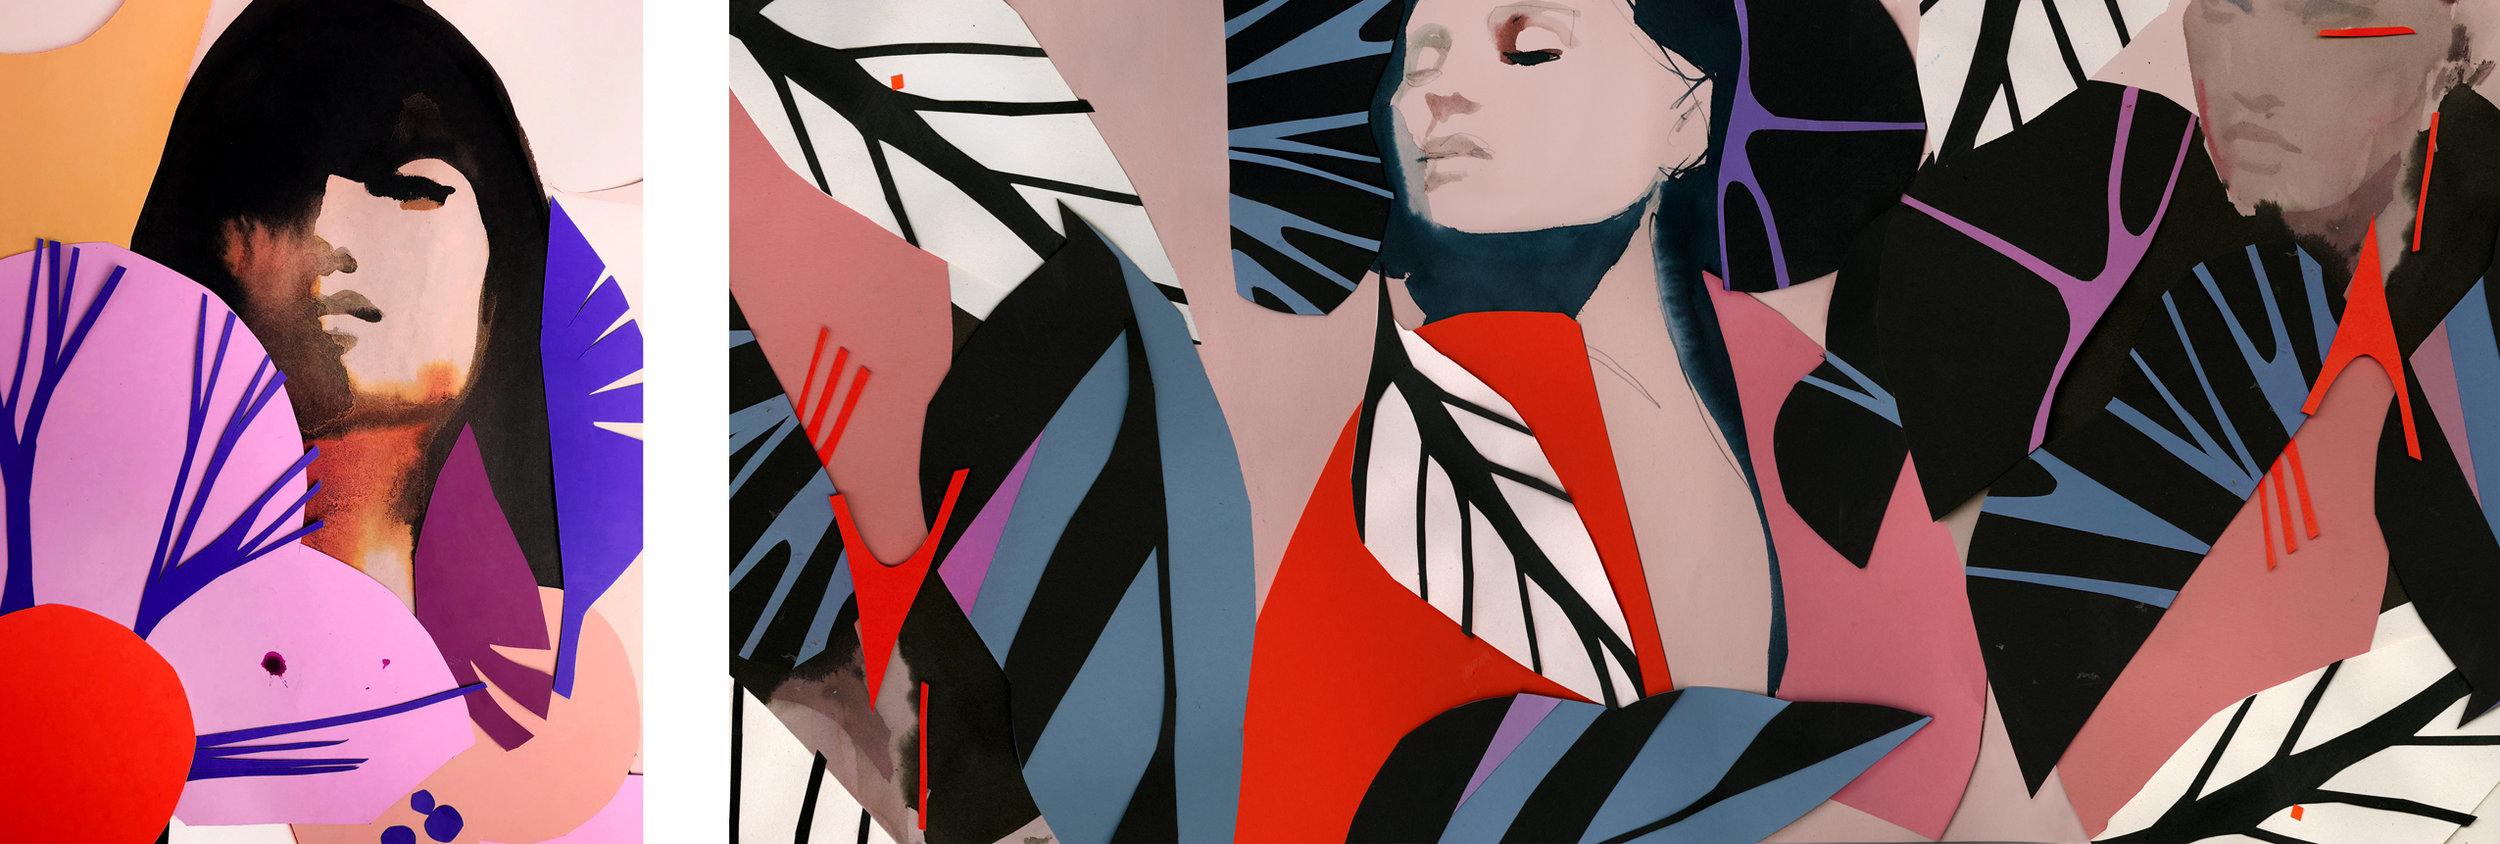 stina-persson-cut-paper-artpiece copy.jpg